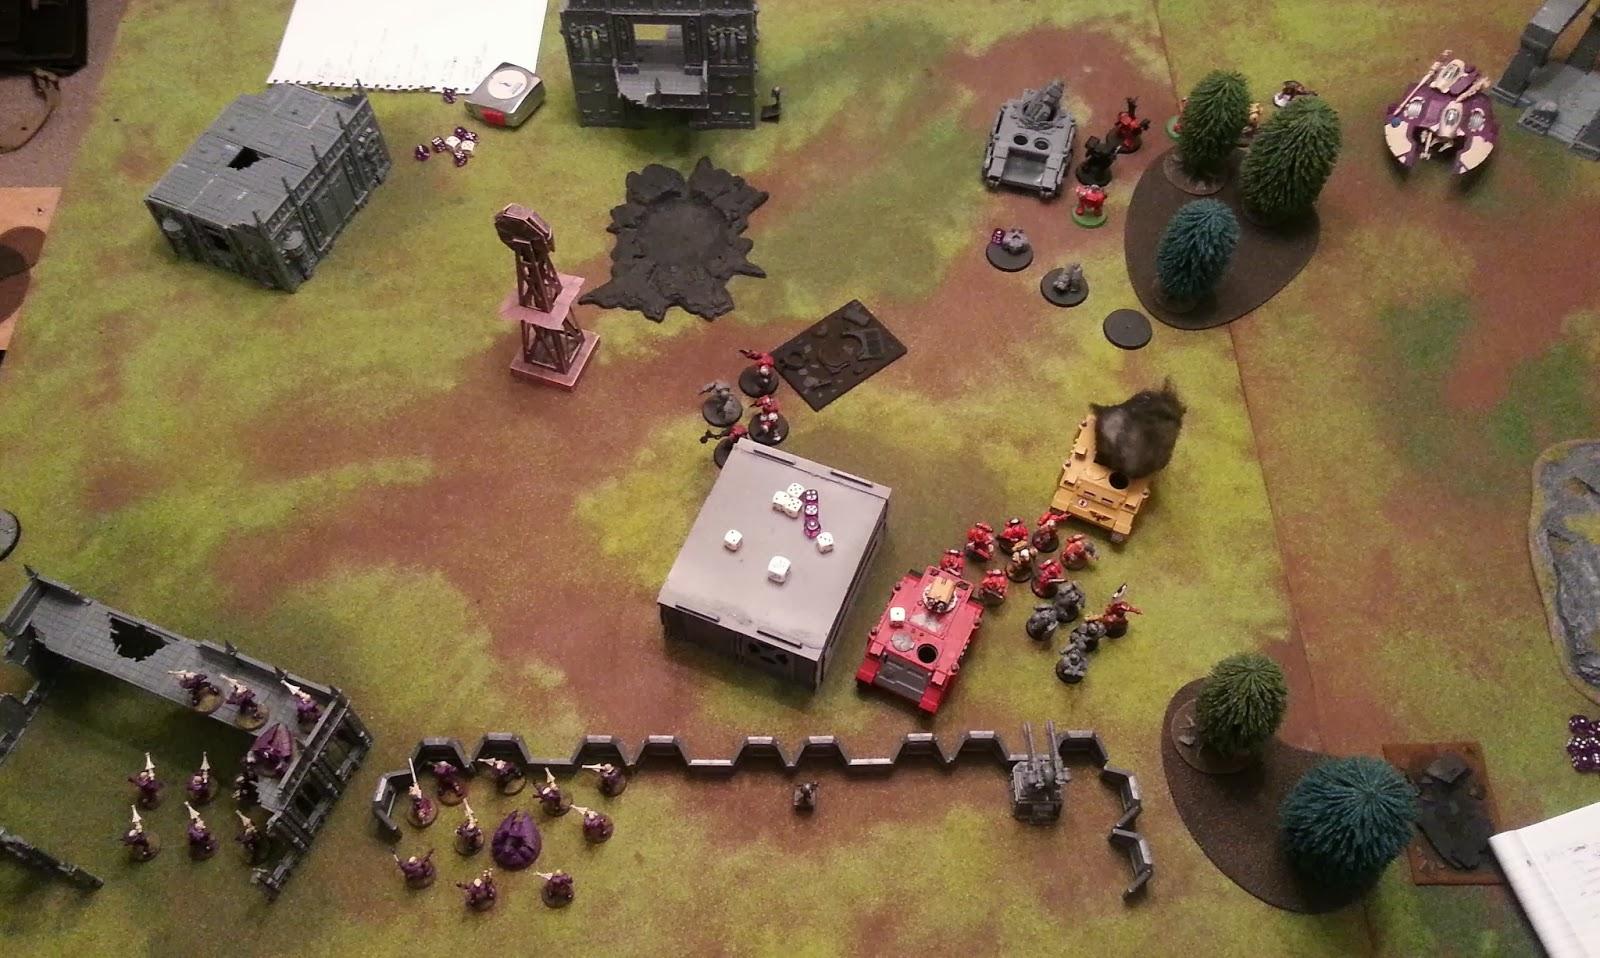 Fist of the emperor eldar vs imperial fists 1850 tournament